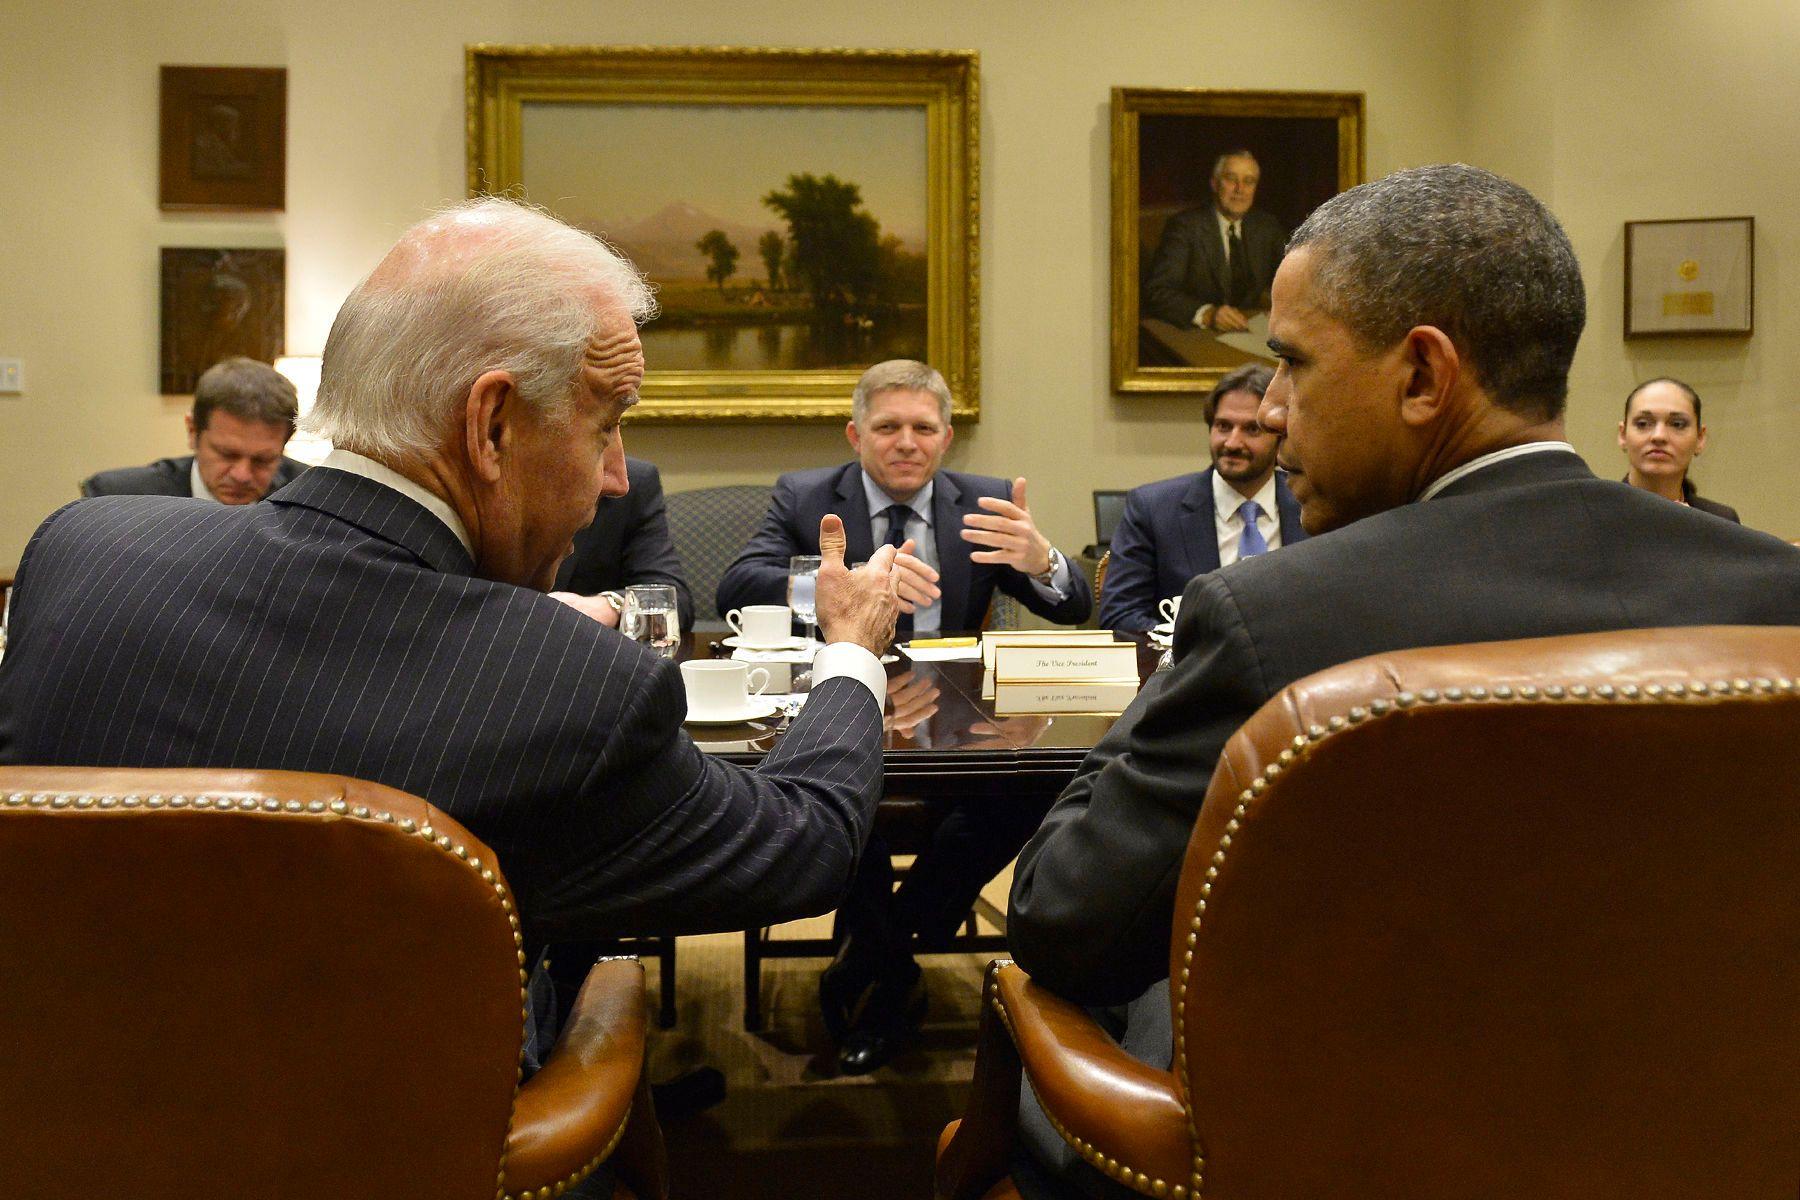 President Barack Obama and Vice President Joe Biden meet Prime Minister of Slovakia Robert Fico in White House.